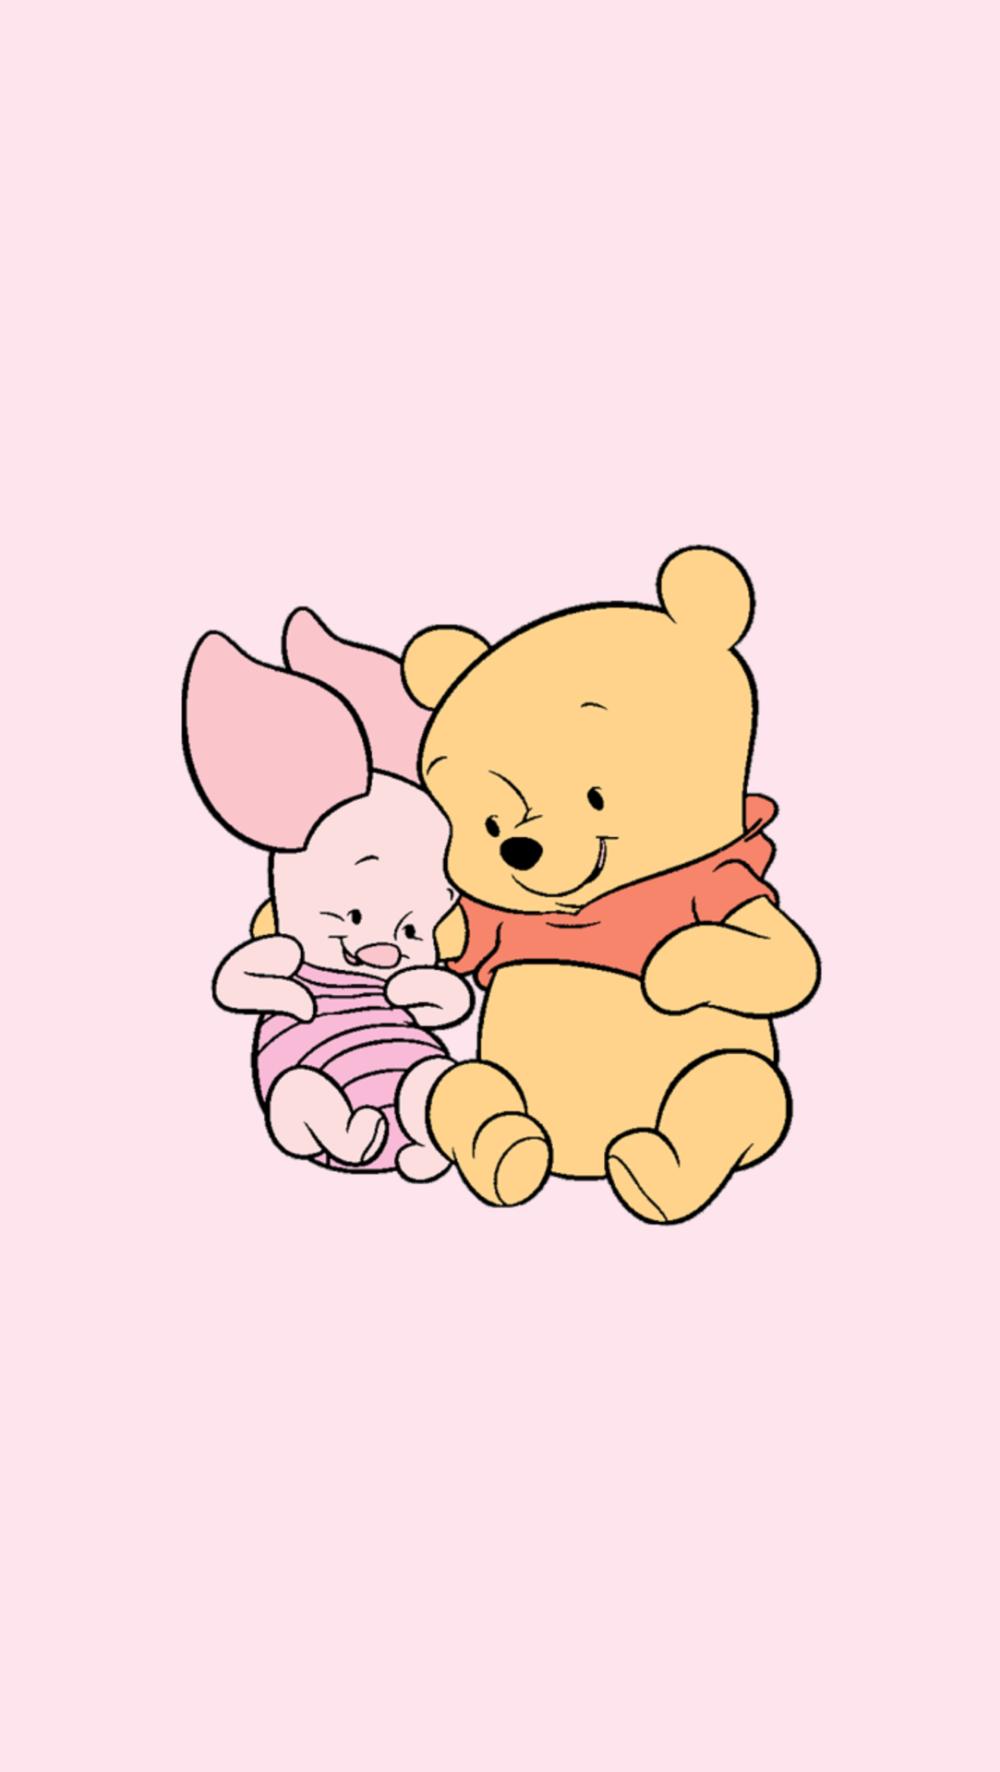 Cupcakesandrainbowsxoxo Baby Pooh Bear Lockscreens Cutewallpaperbackgrounds Wallpaper Iphone Disney Disney Wallpaper Cute Disney Wallpaper